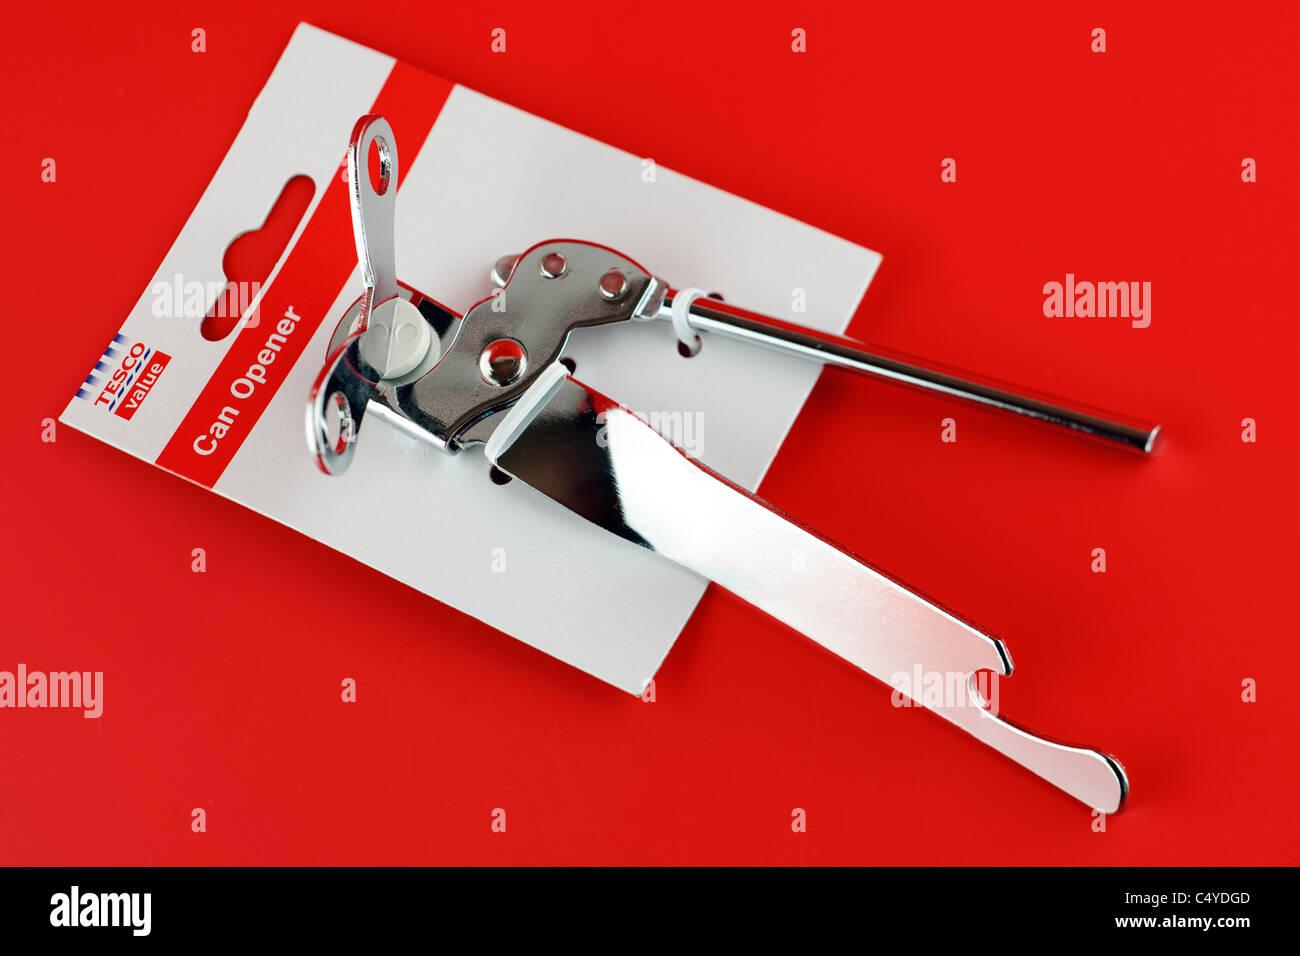 Tesco can opener - Stock Image